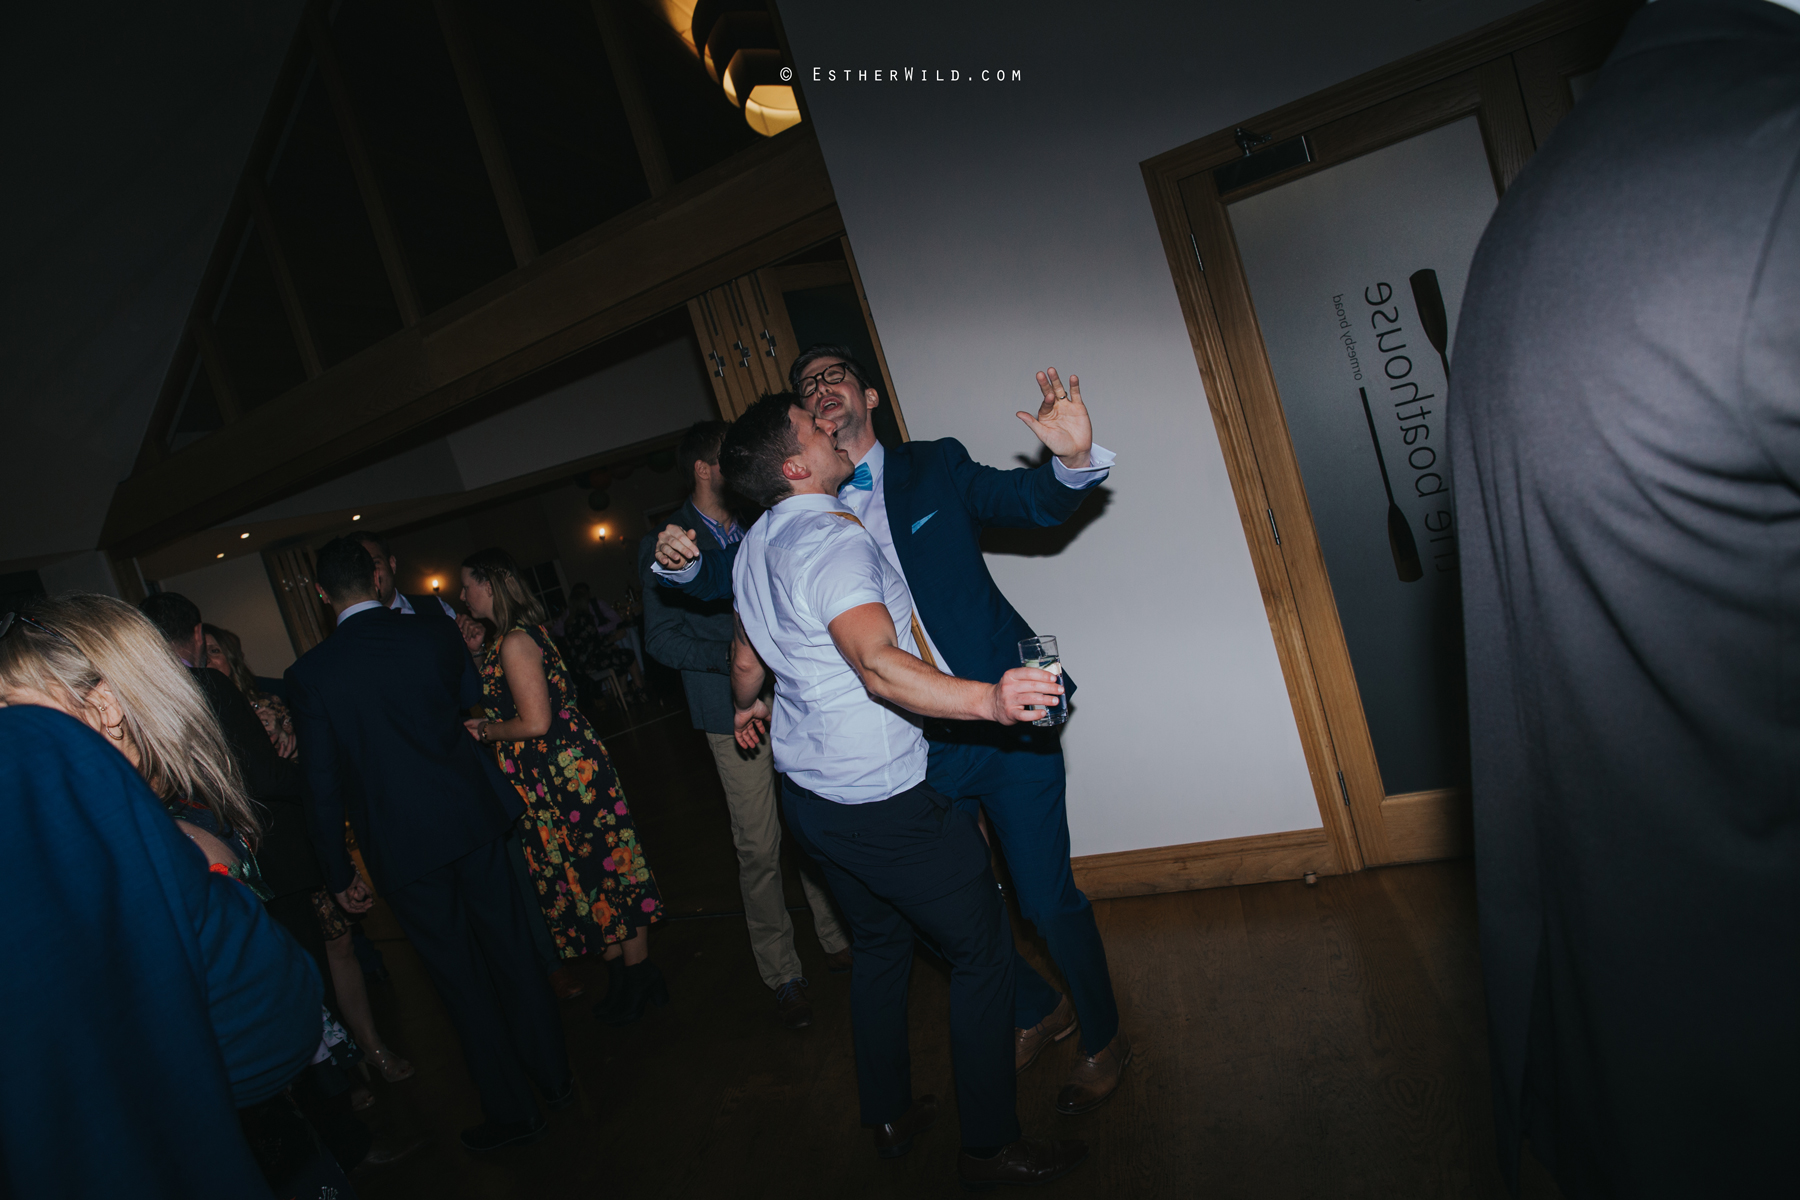 The_BoatHouse_Wedding_Venue_Ormesby_Norfolk_Broads_Boat_Wedding_Photography_Esther_Wild_Photographer_IMG_3729.jpg